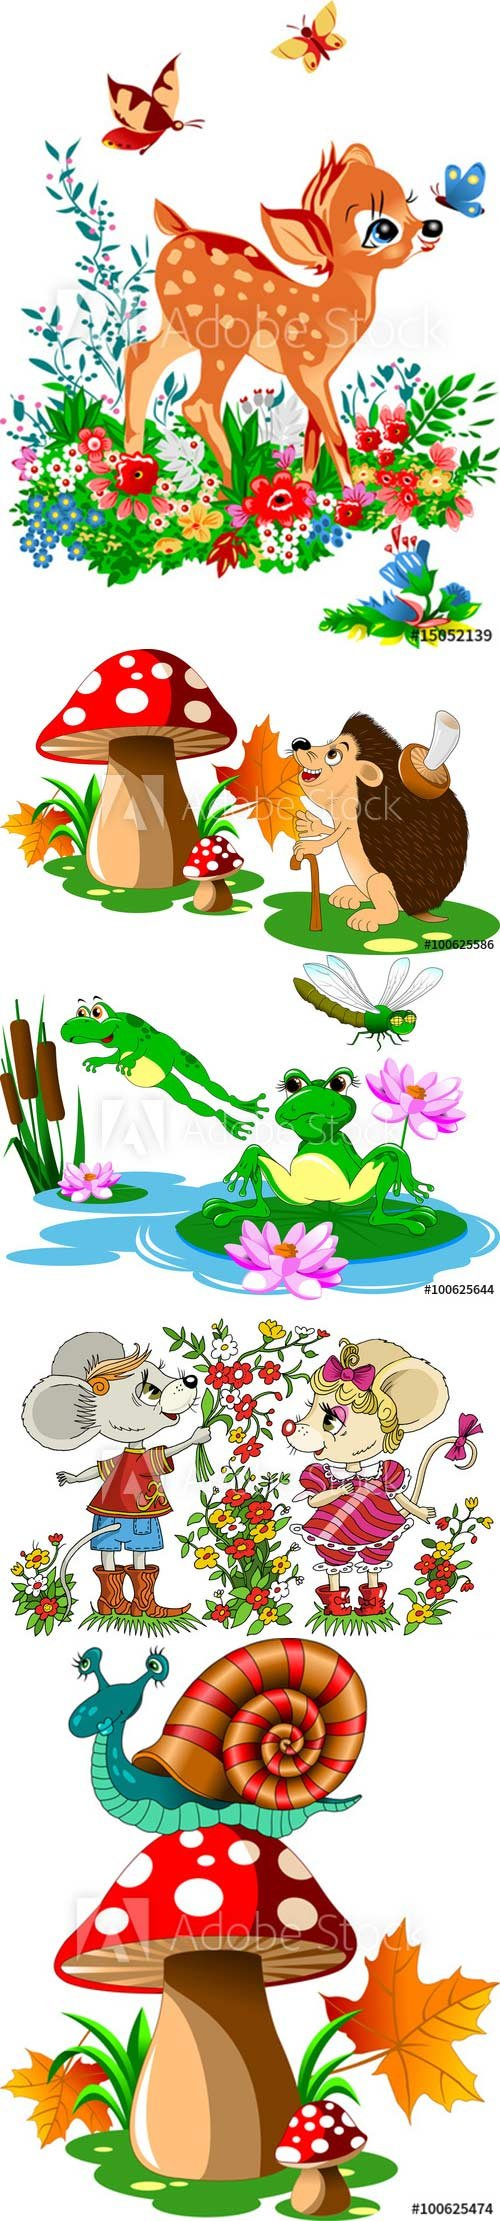 Cartoon vector illustration with animals